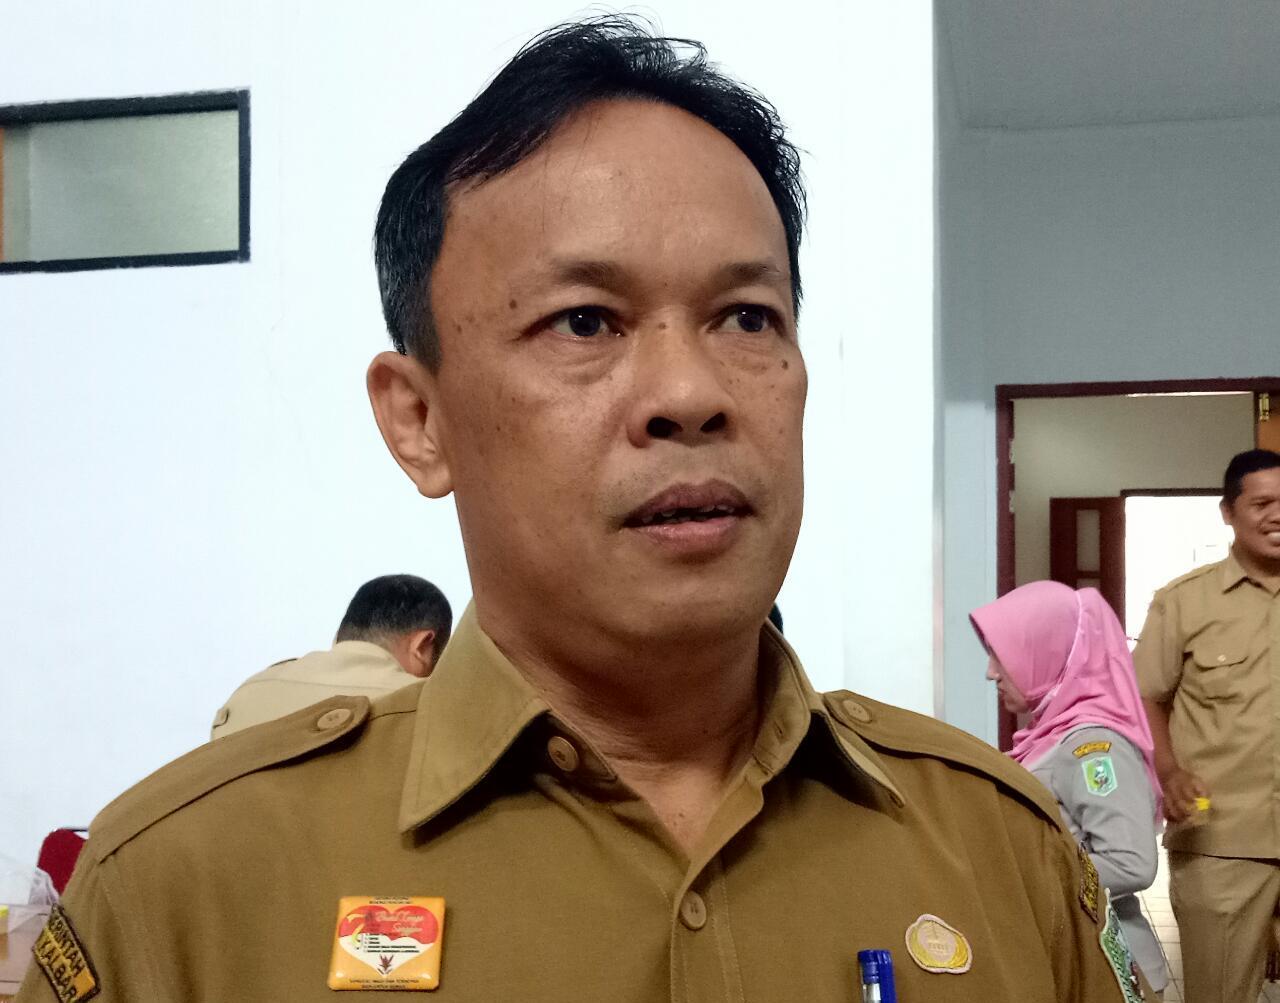 Foto--Kepala Kepegawaian dan Pengembangan Sumber Daya Manusia (BKPSDM) Kabupaten Sanggau, Herkulanus HP